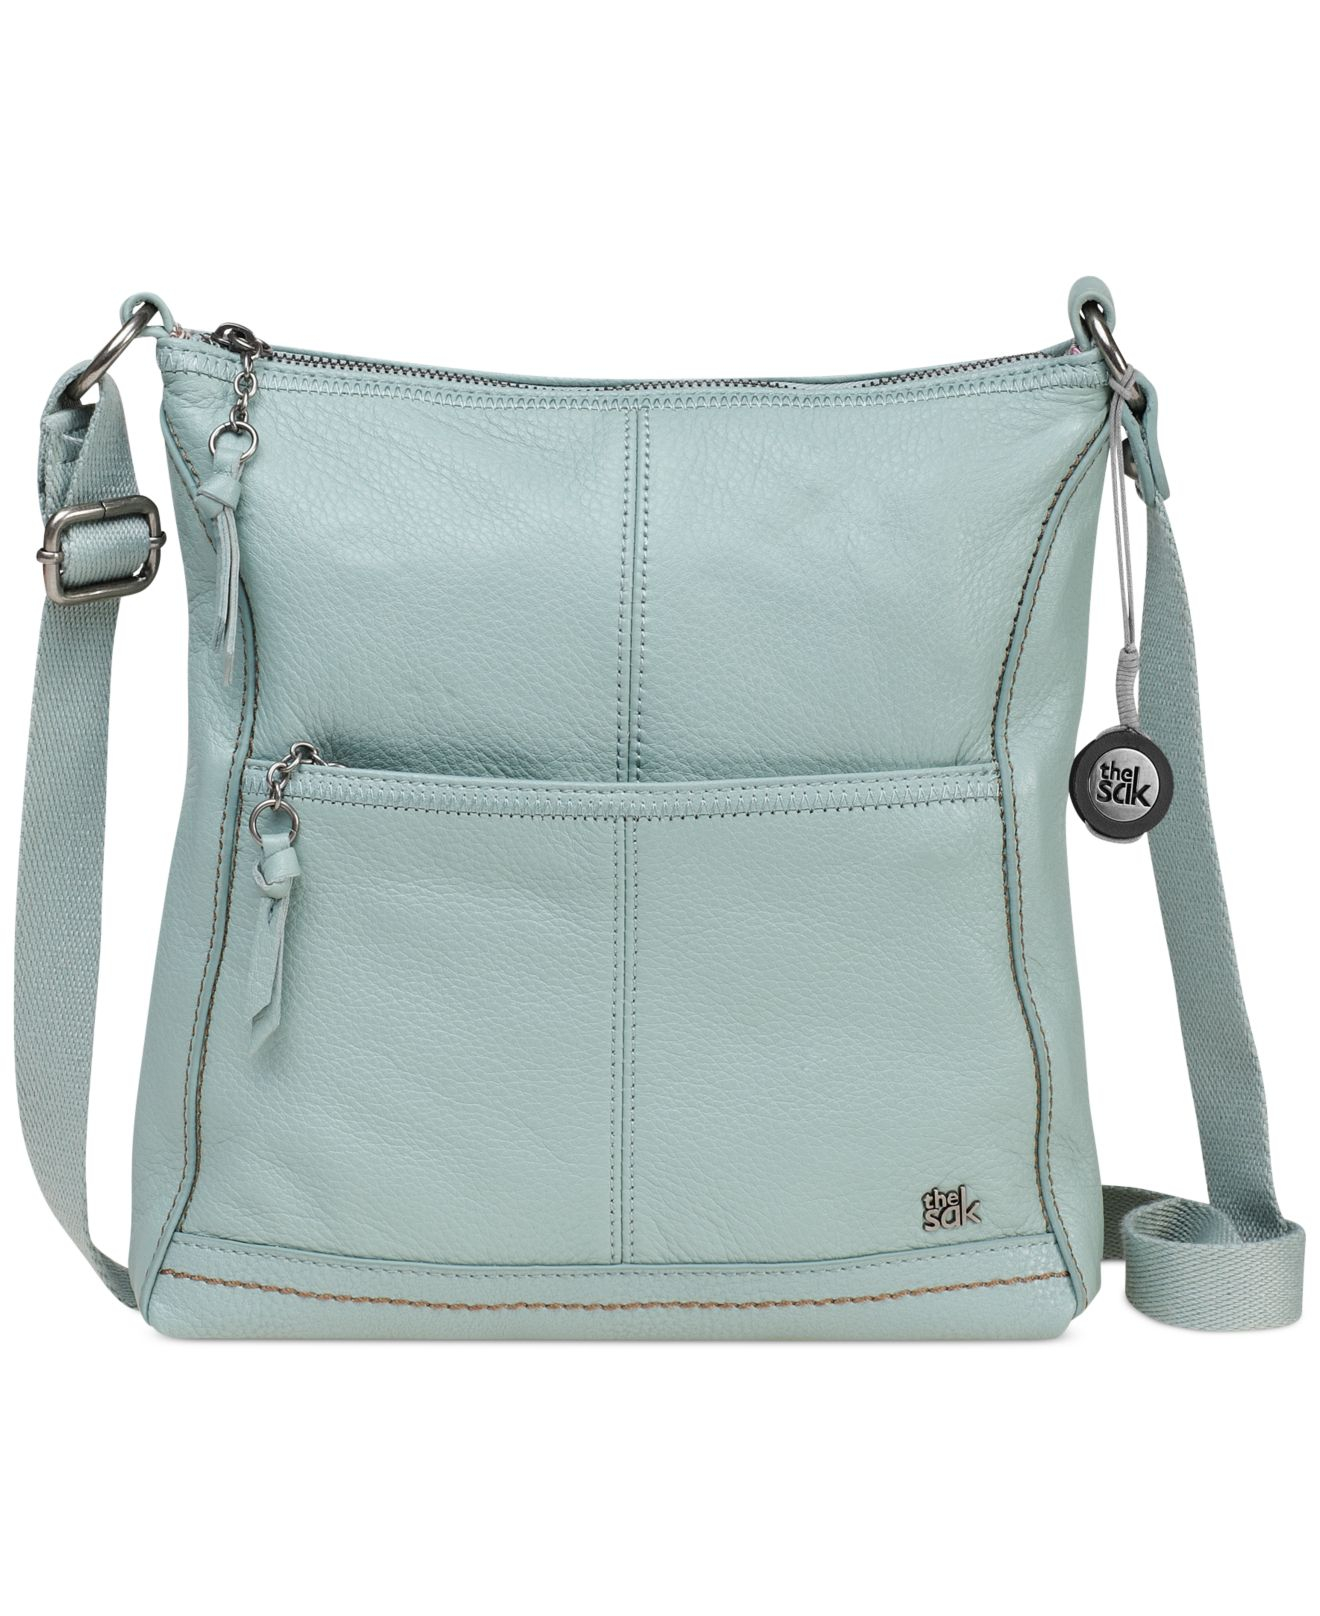 Lyst - The Sak Iris Leather Crossbody Bag in Green